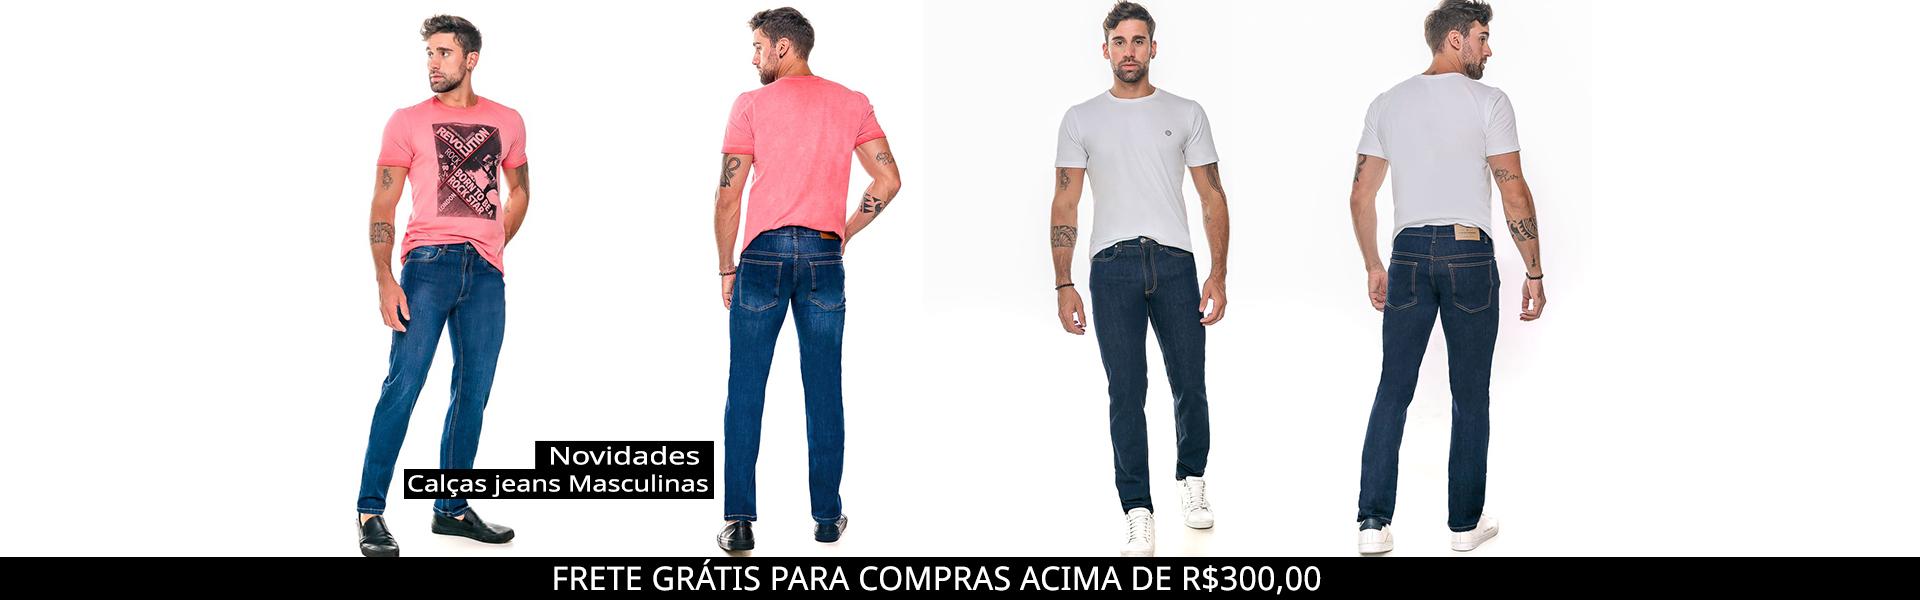 https://www.latifundio.com.br/roupa-feminina/calca-feminina